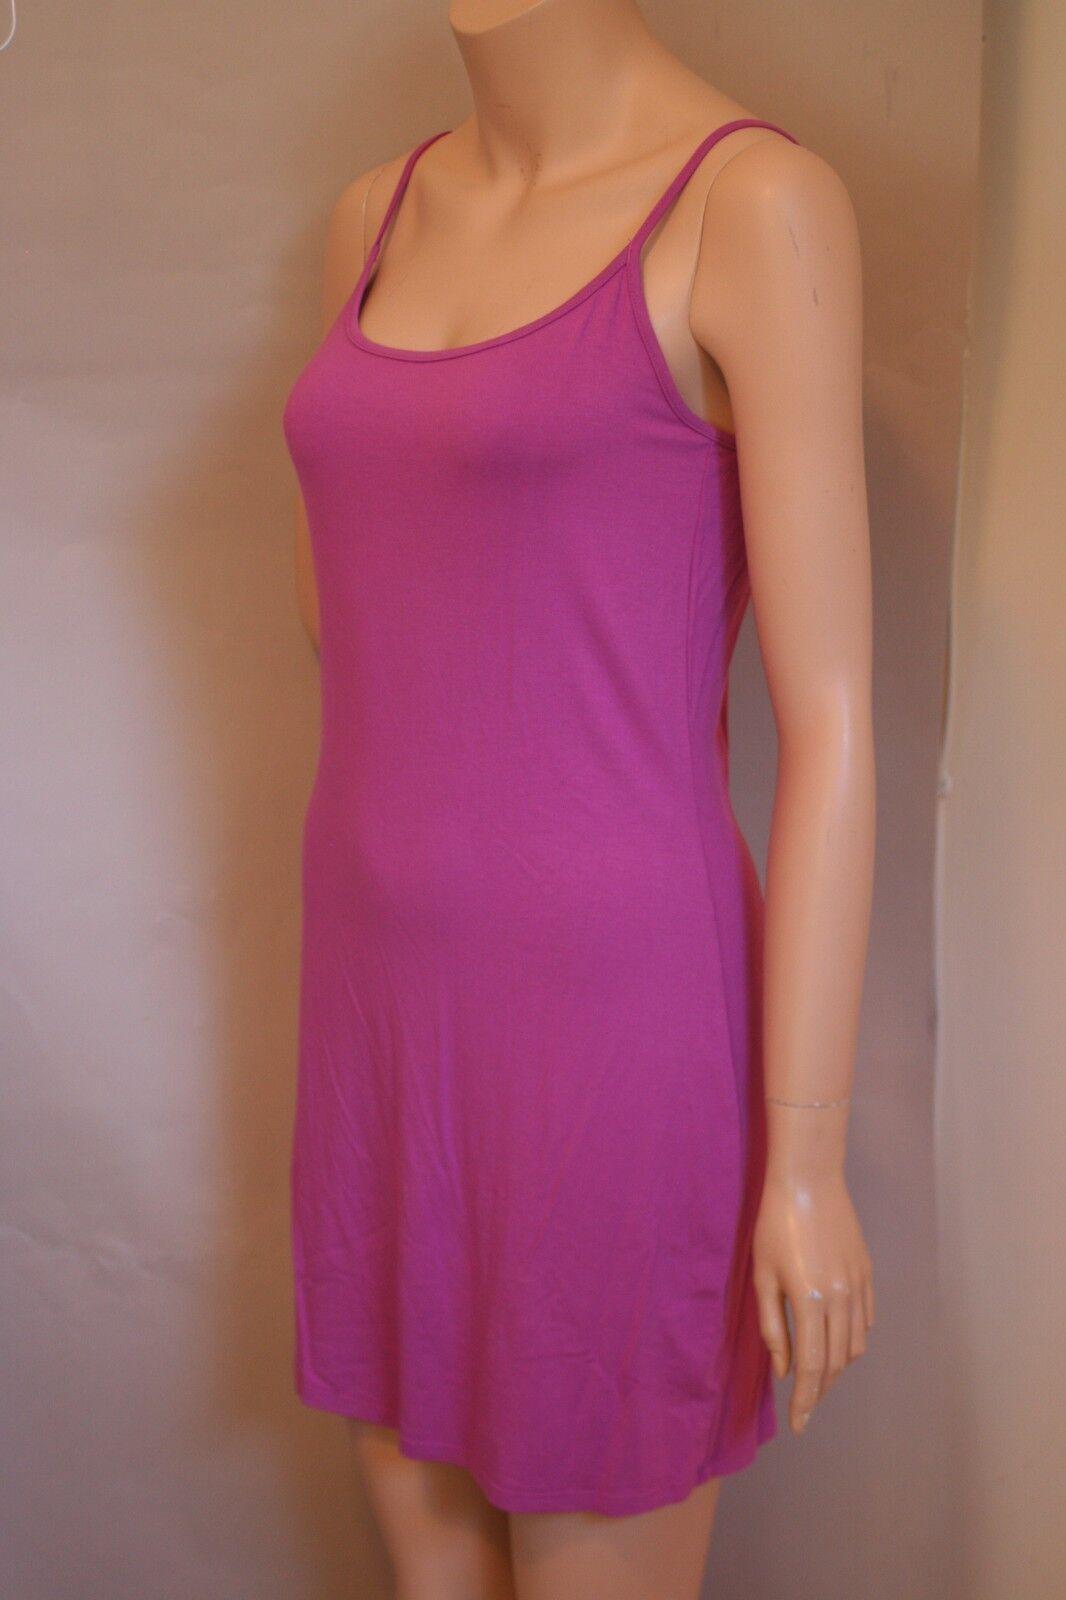 Lilly Pulitzer Womens Dress Size S Paula Sweater Sweater Sweater Dress Purple  NWOT d49e7d